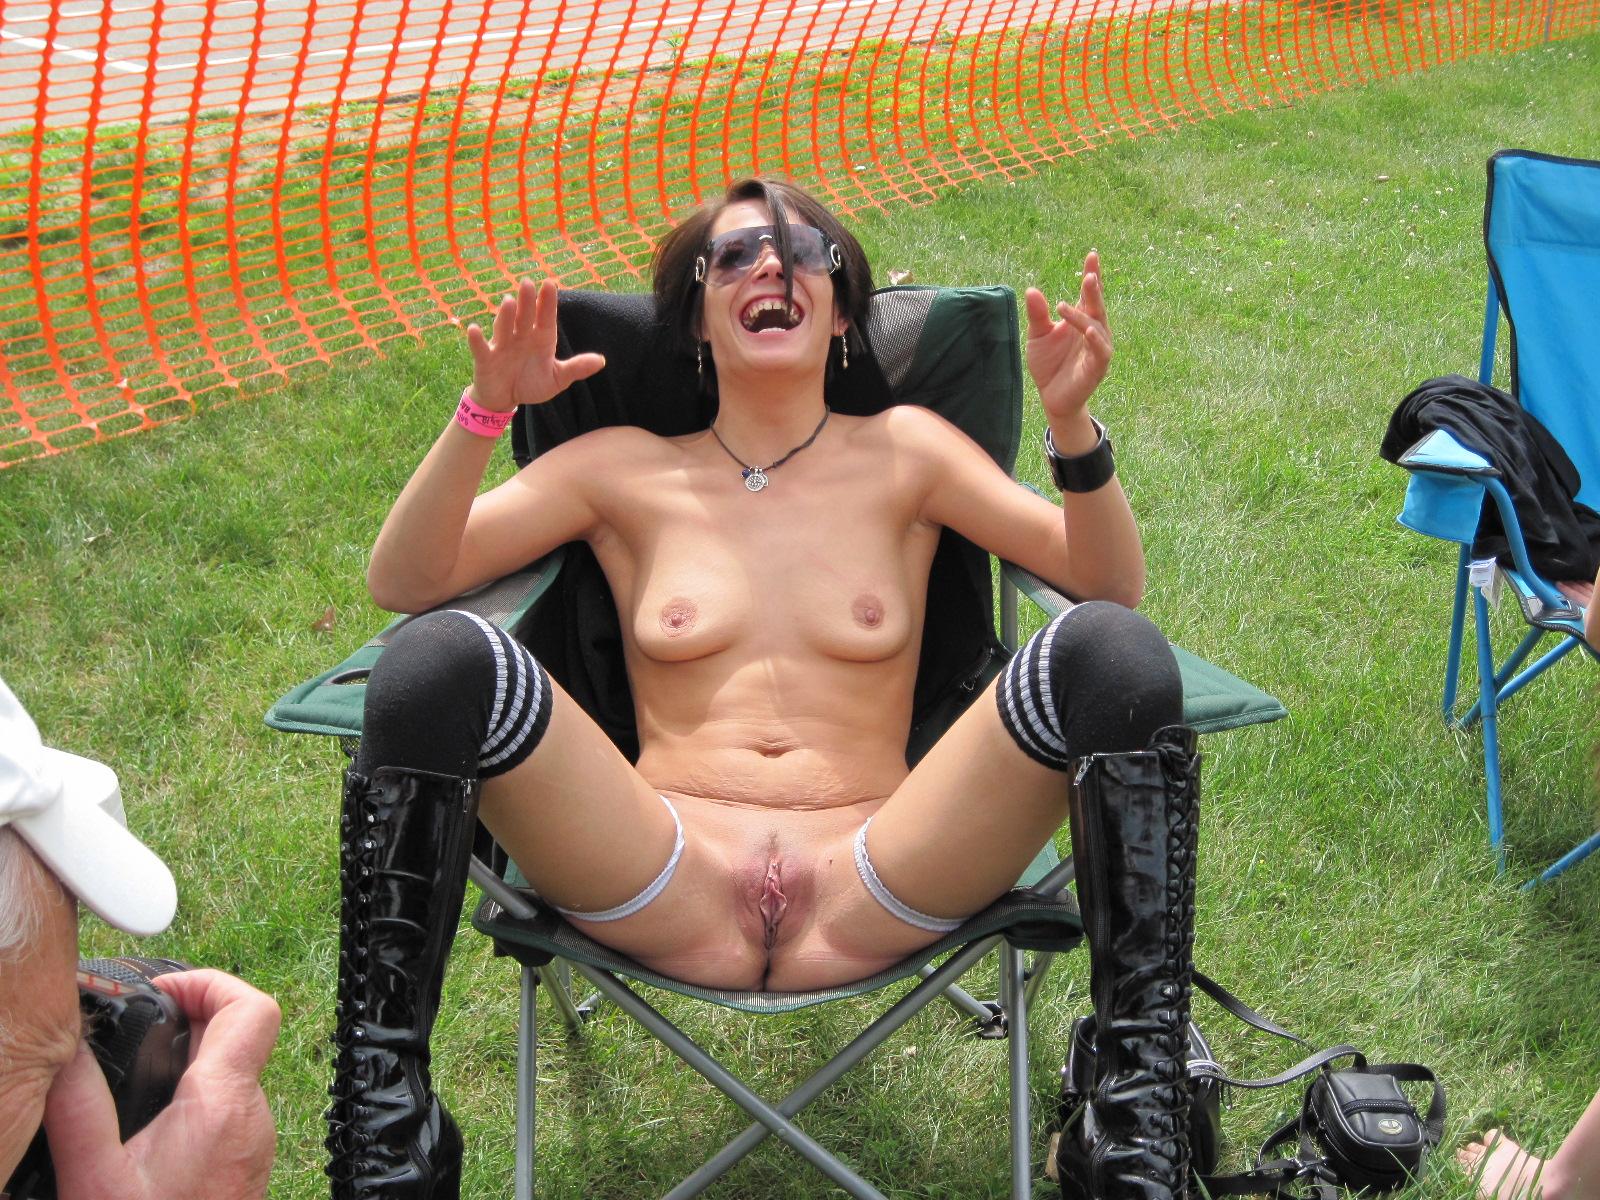 Everquet nude women exploited download